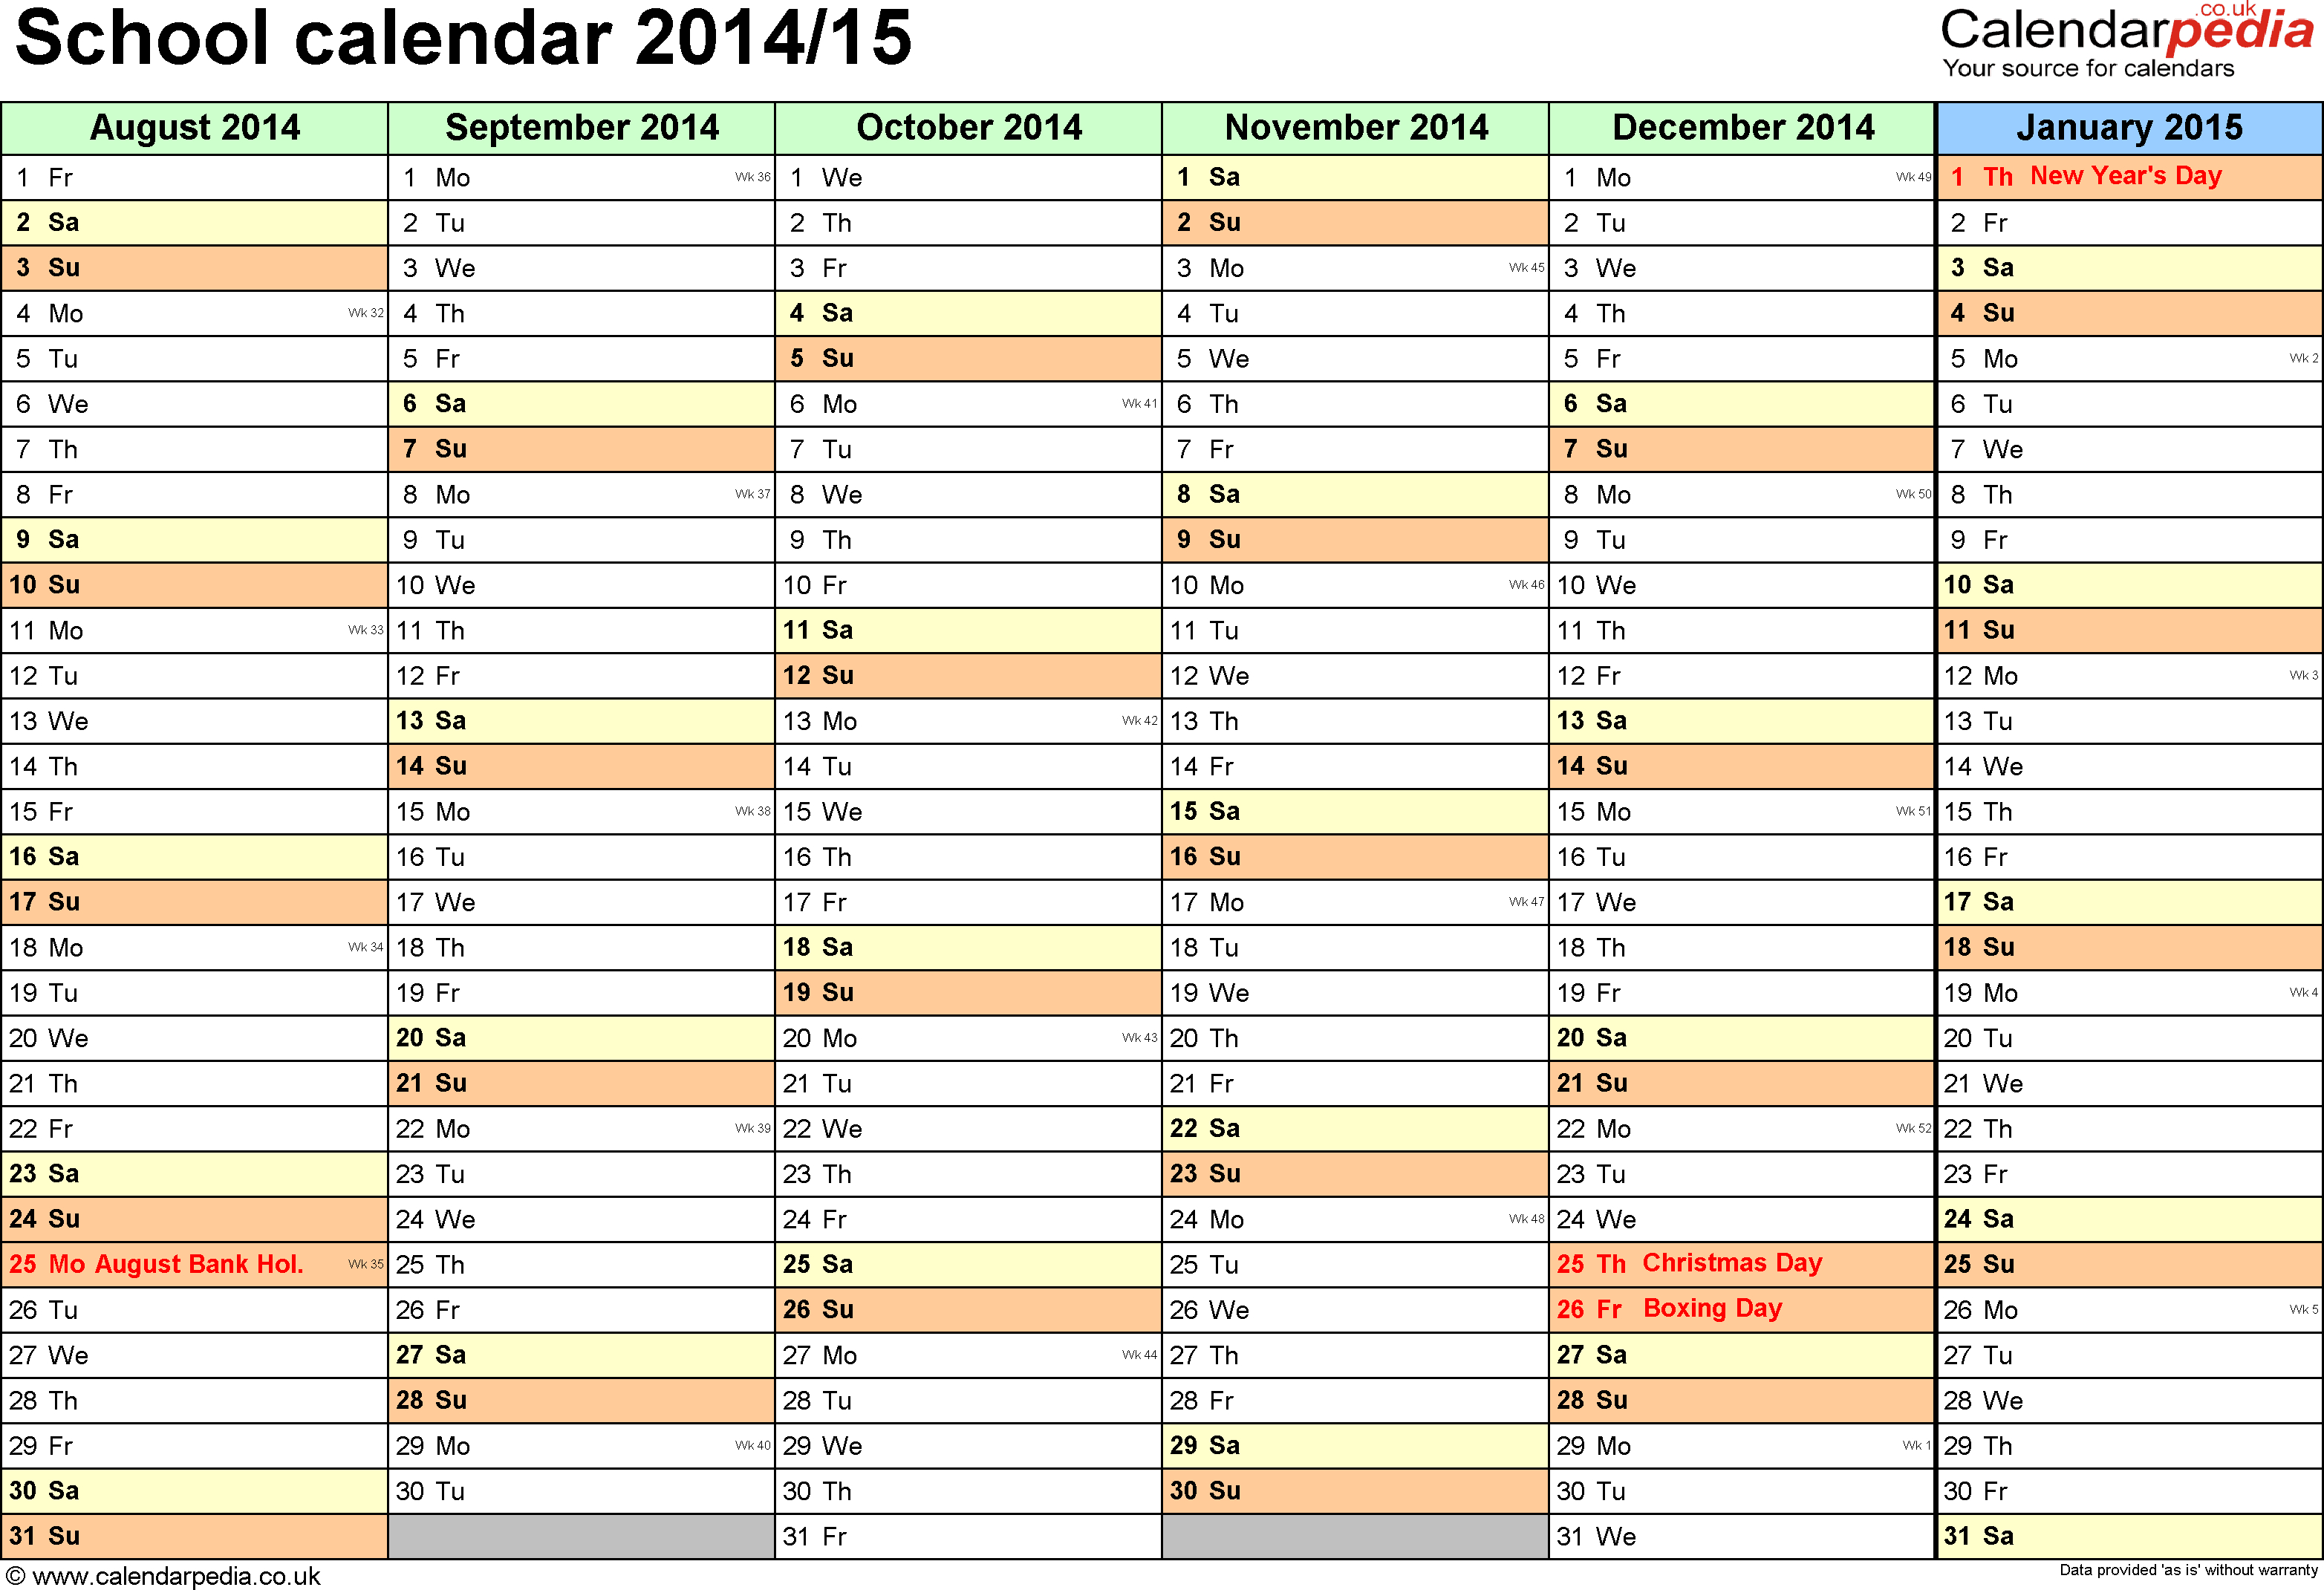 018 Weekly School Schedule Template Word Ideas Calendar Rare